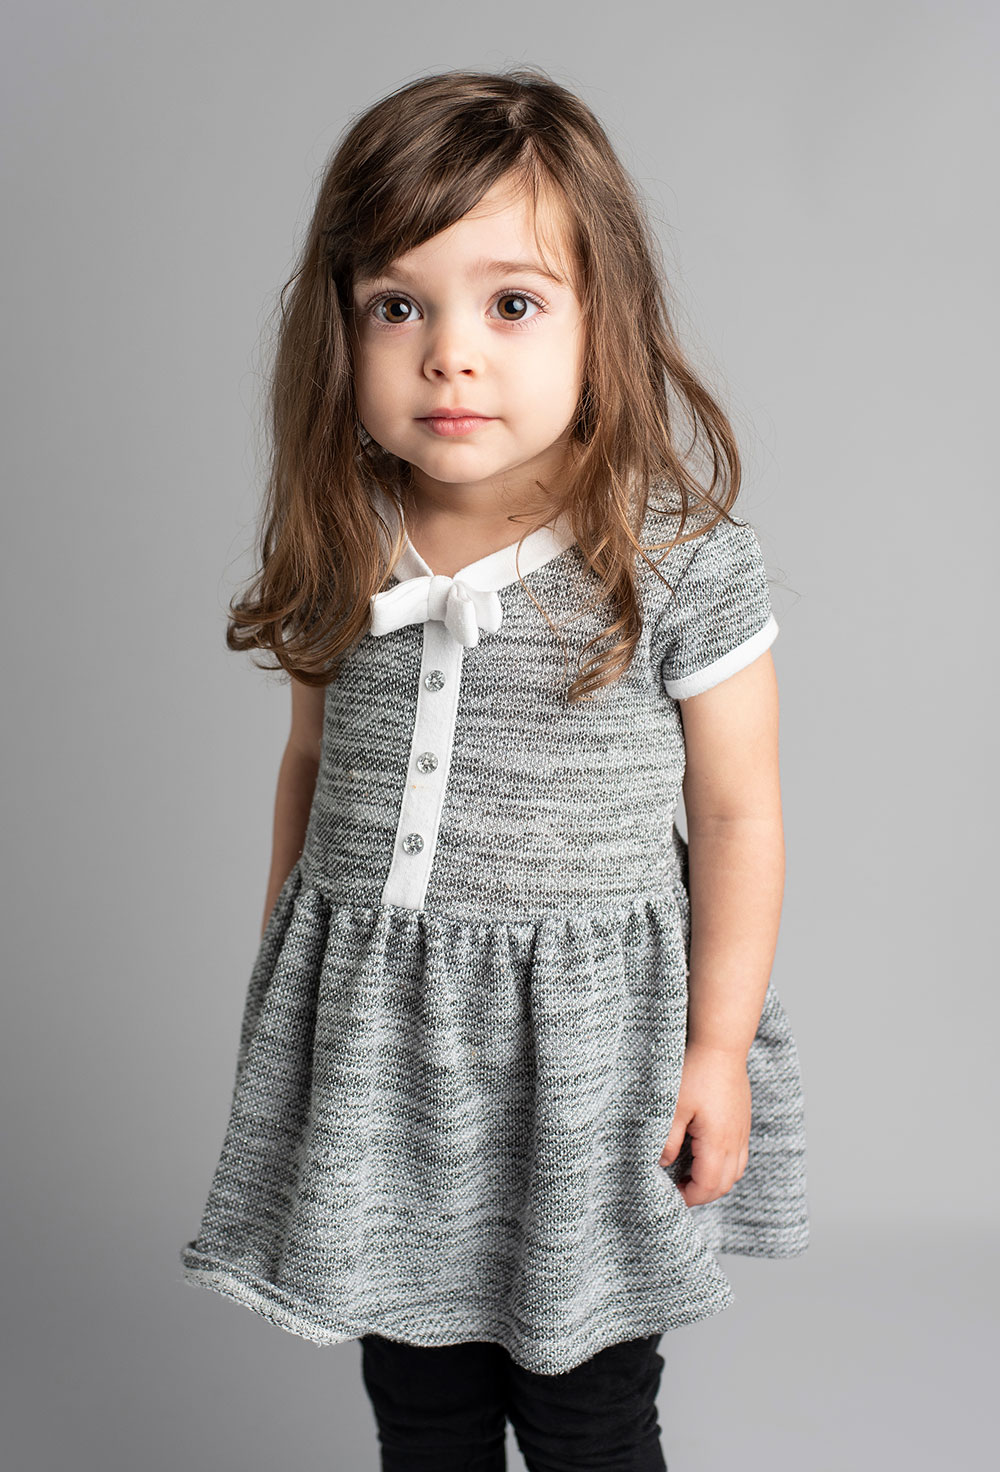 Heights-Preschool-Portraits-014.jpg